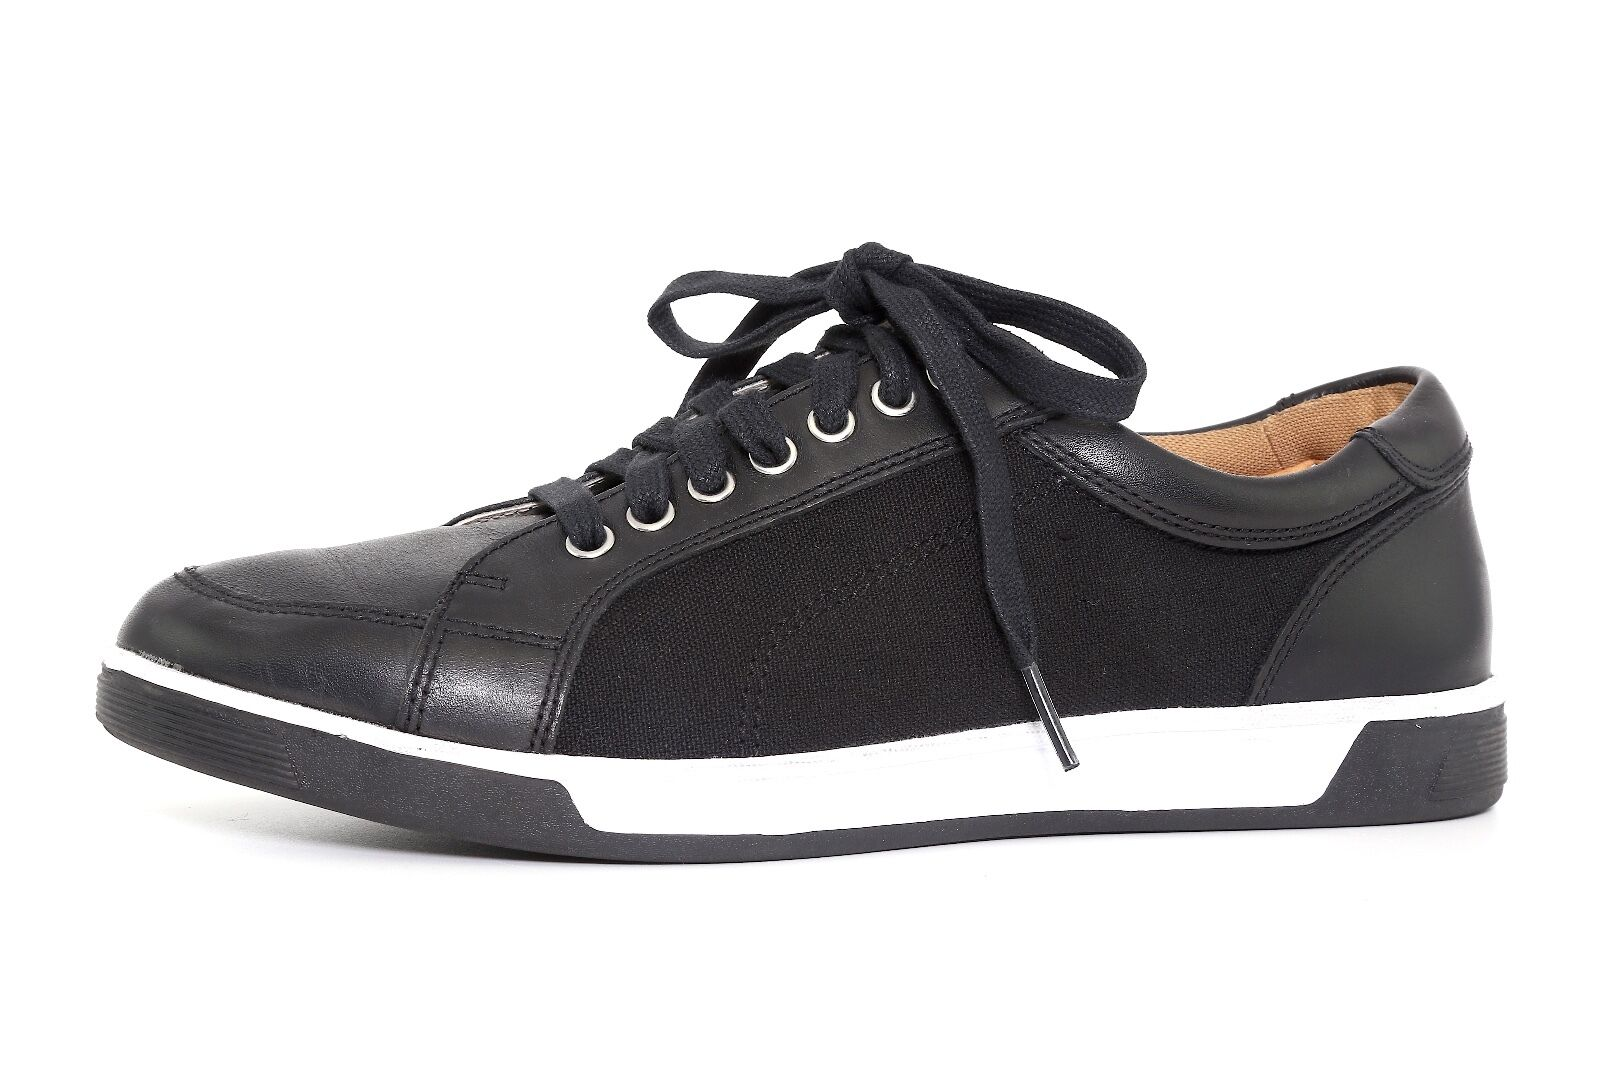 Cole Haan Men's Black Leather Vartan Sport Oxford Sneakers 1051 Sz 8 M